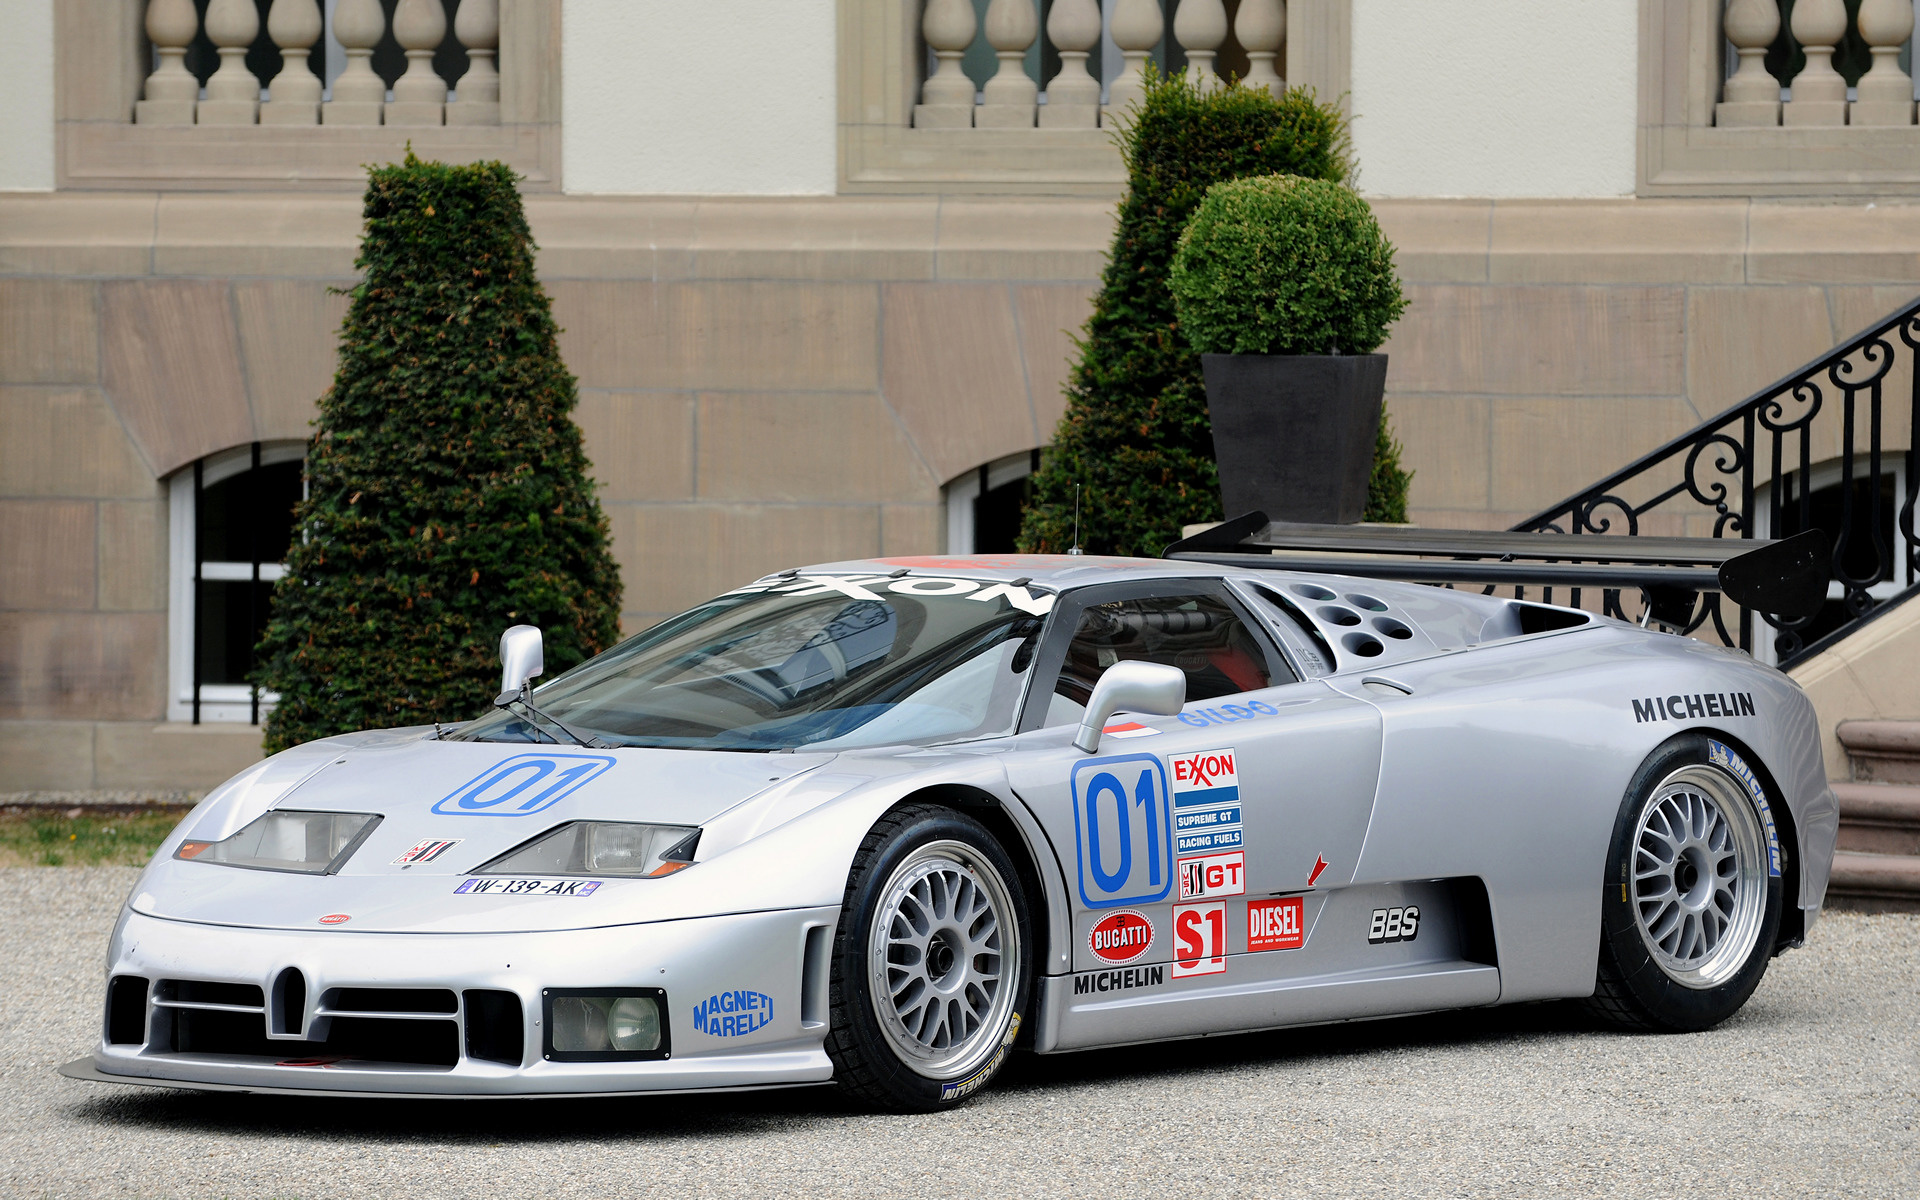 www 89 wallpapers com,land vehicle,vehicle,car,supercar,sports car